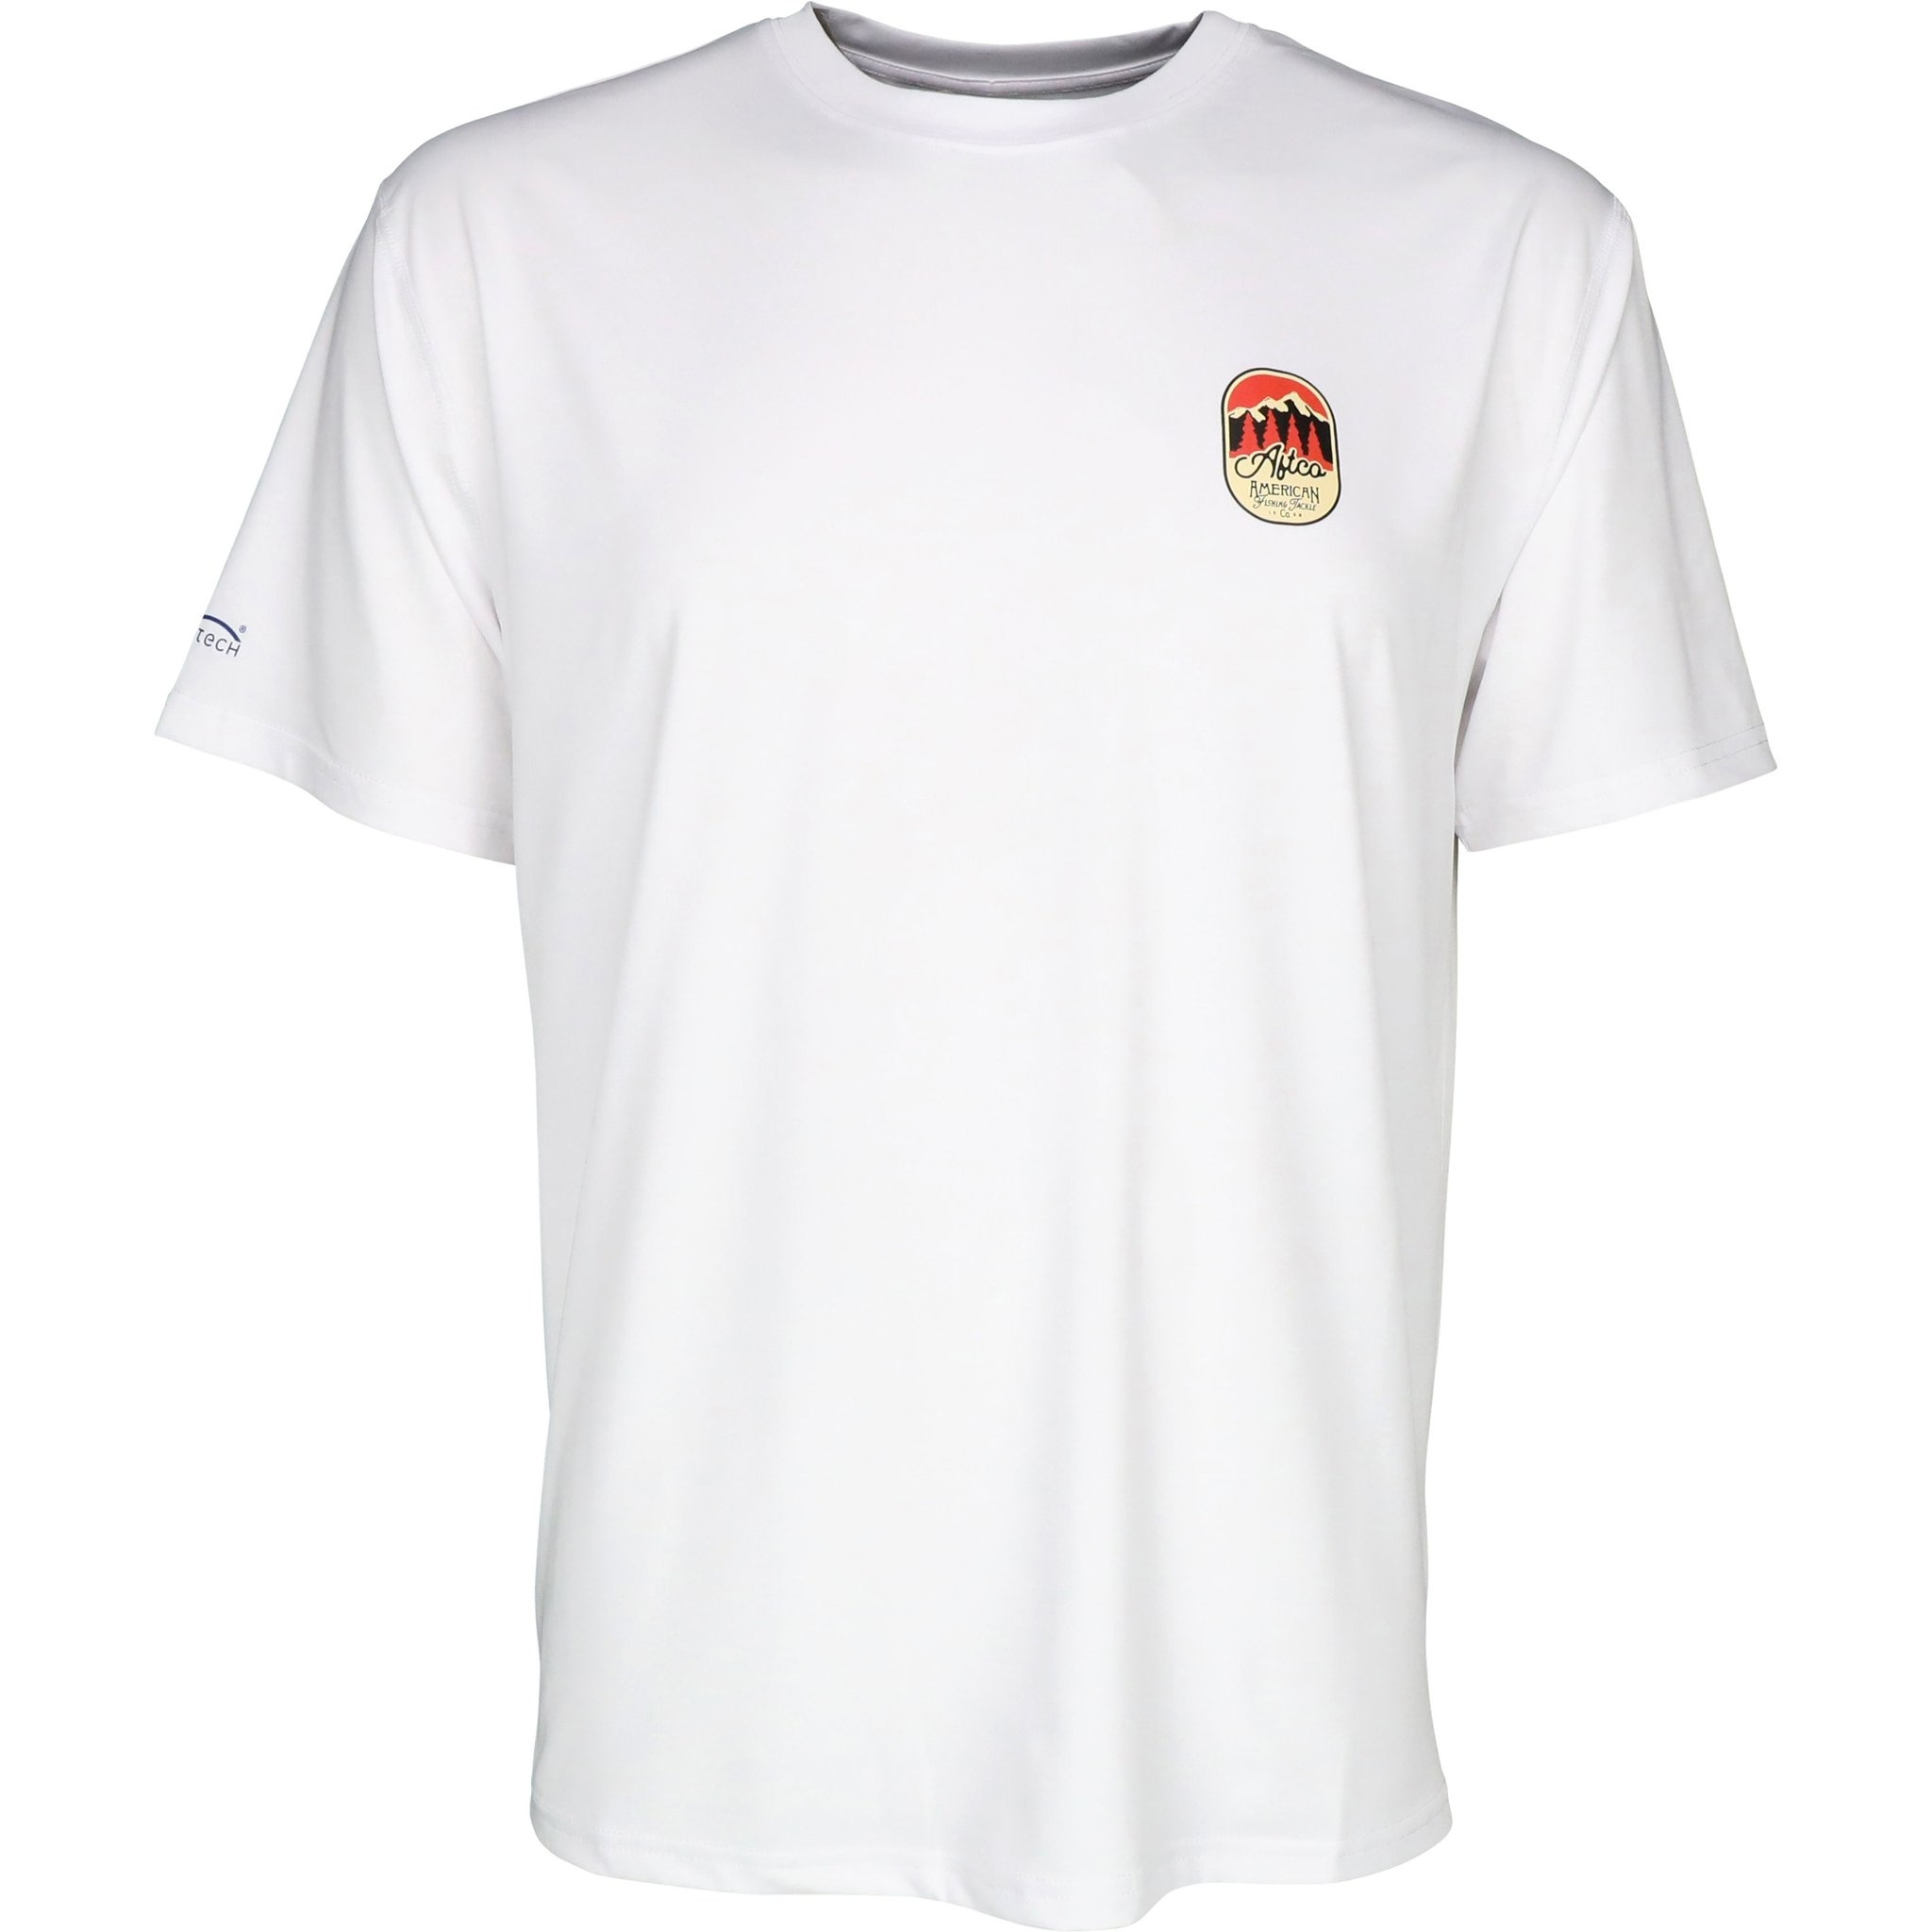 AFTCO Binocular Performance Shirt